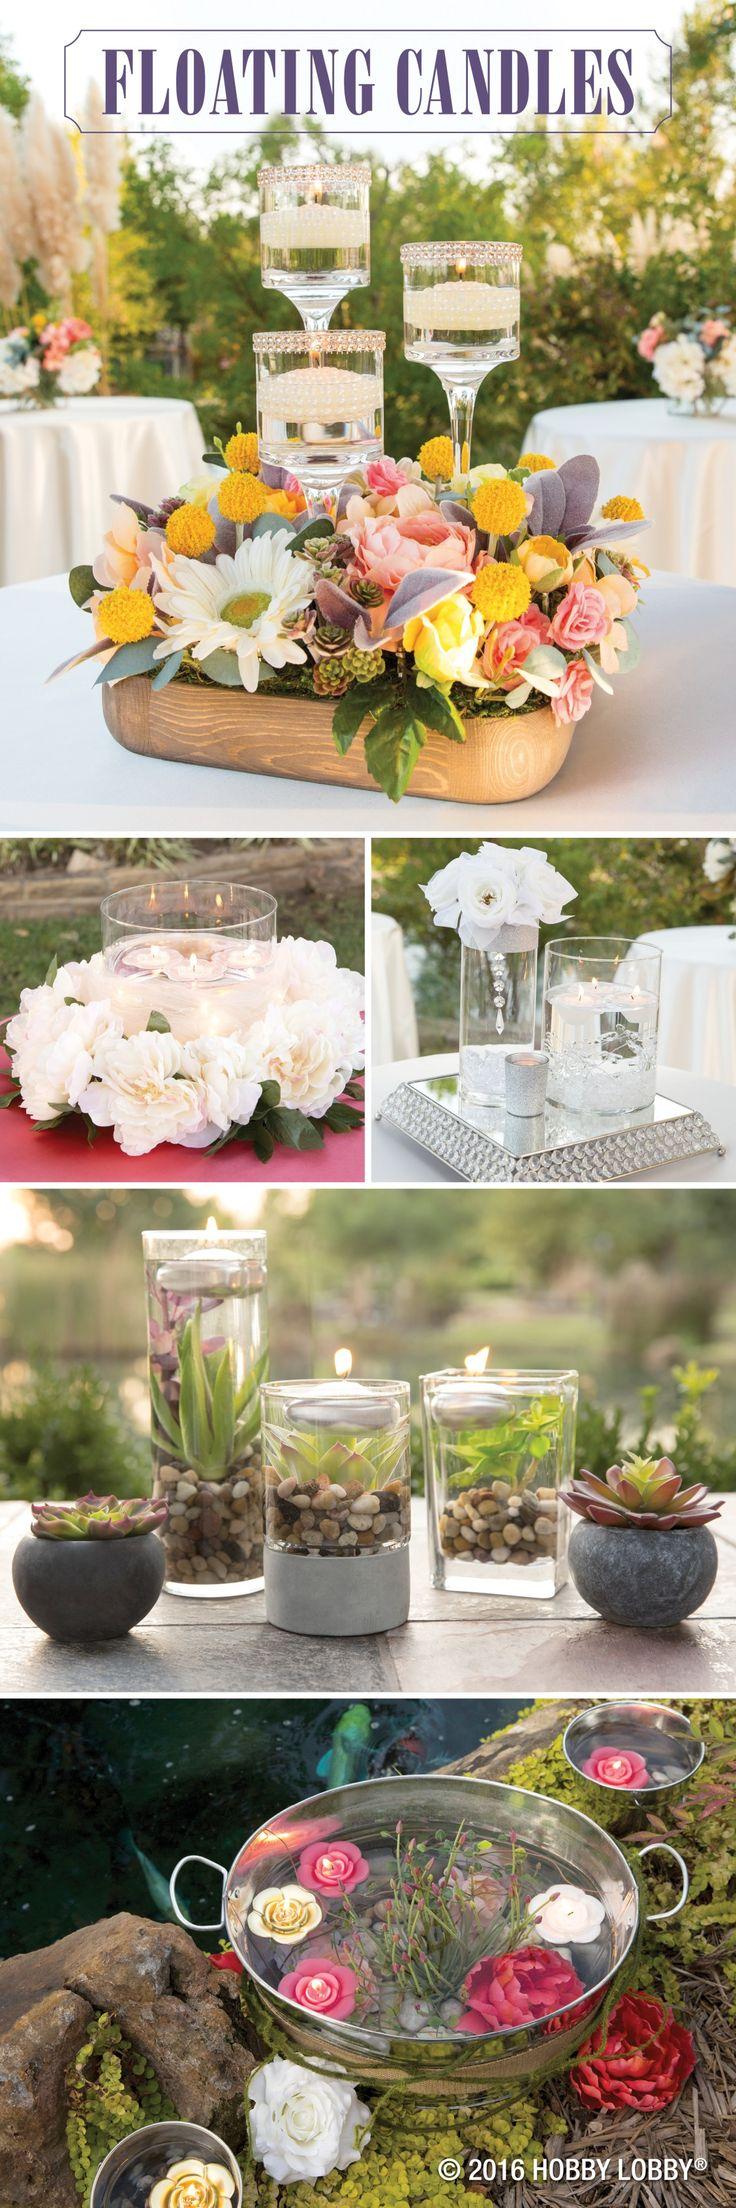 Best images about diy wedding ideas on pinterest le